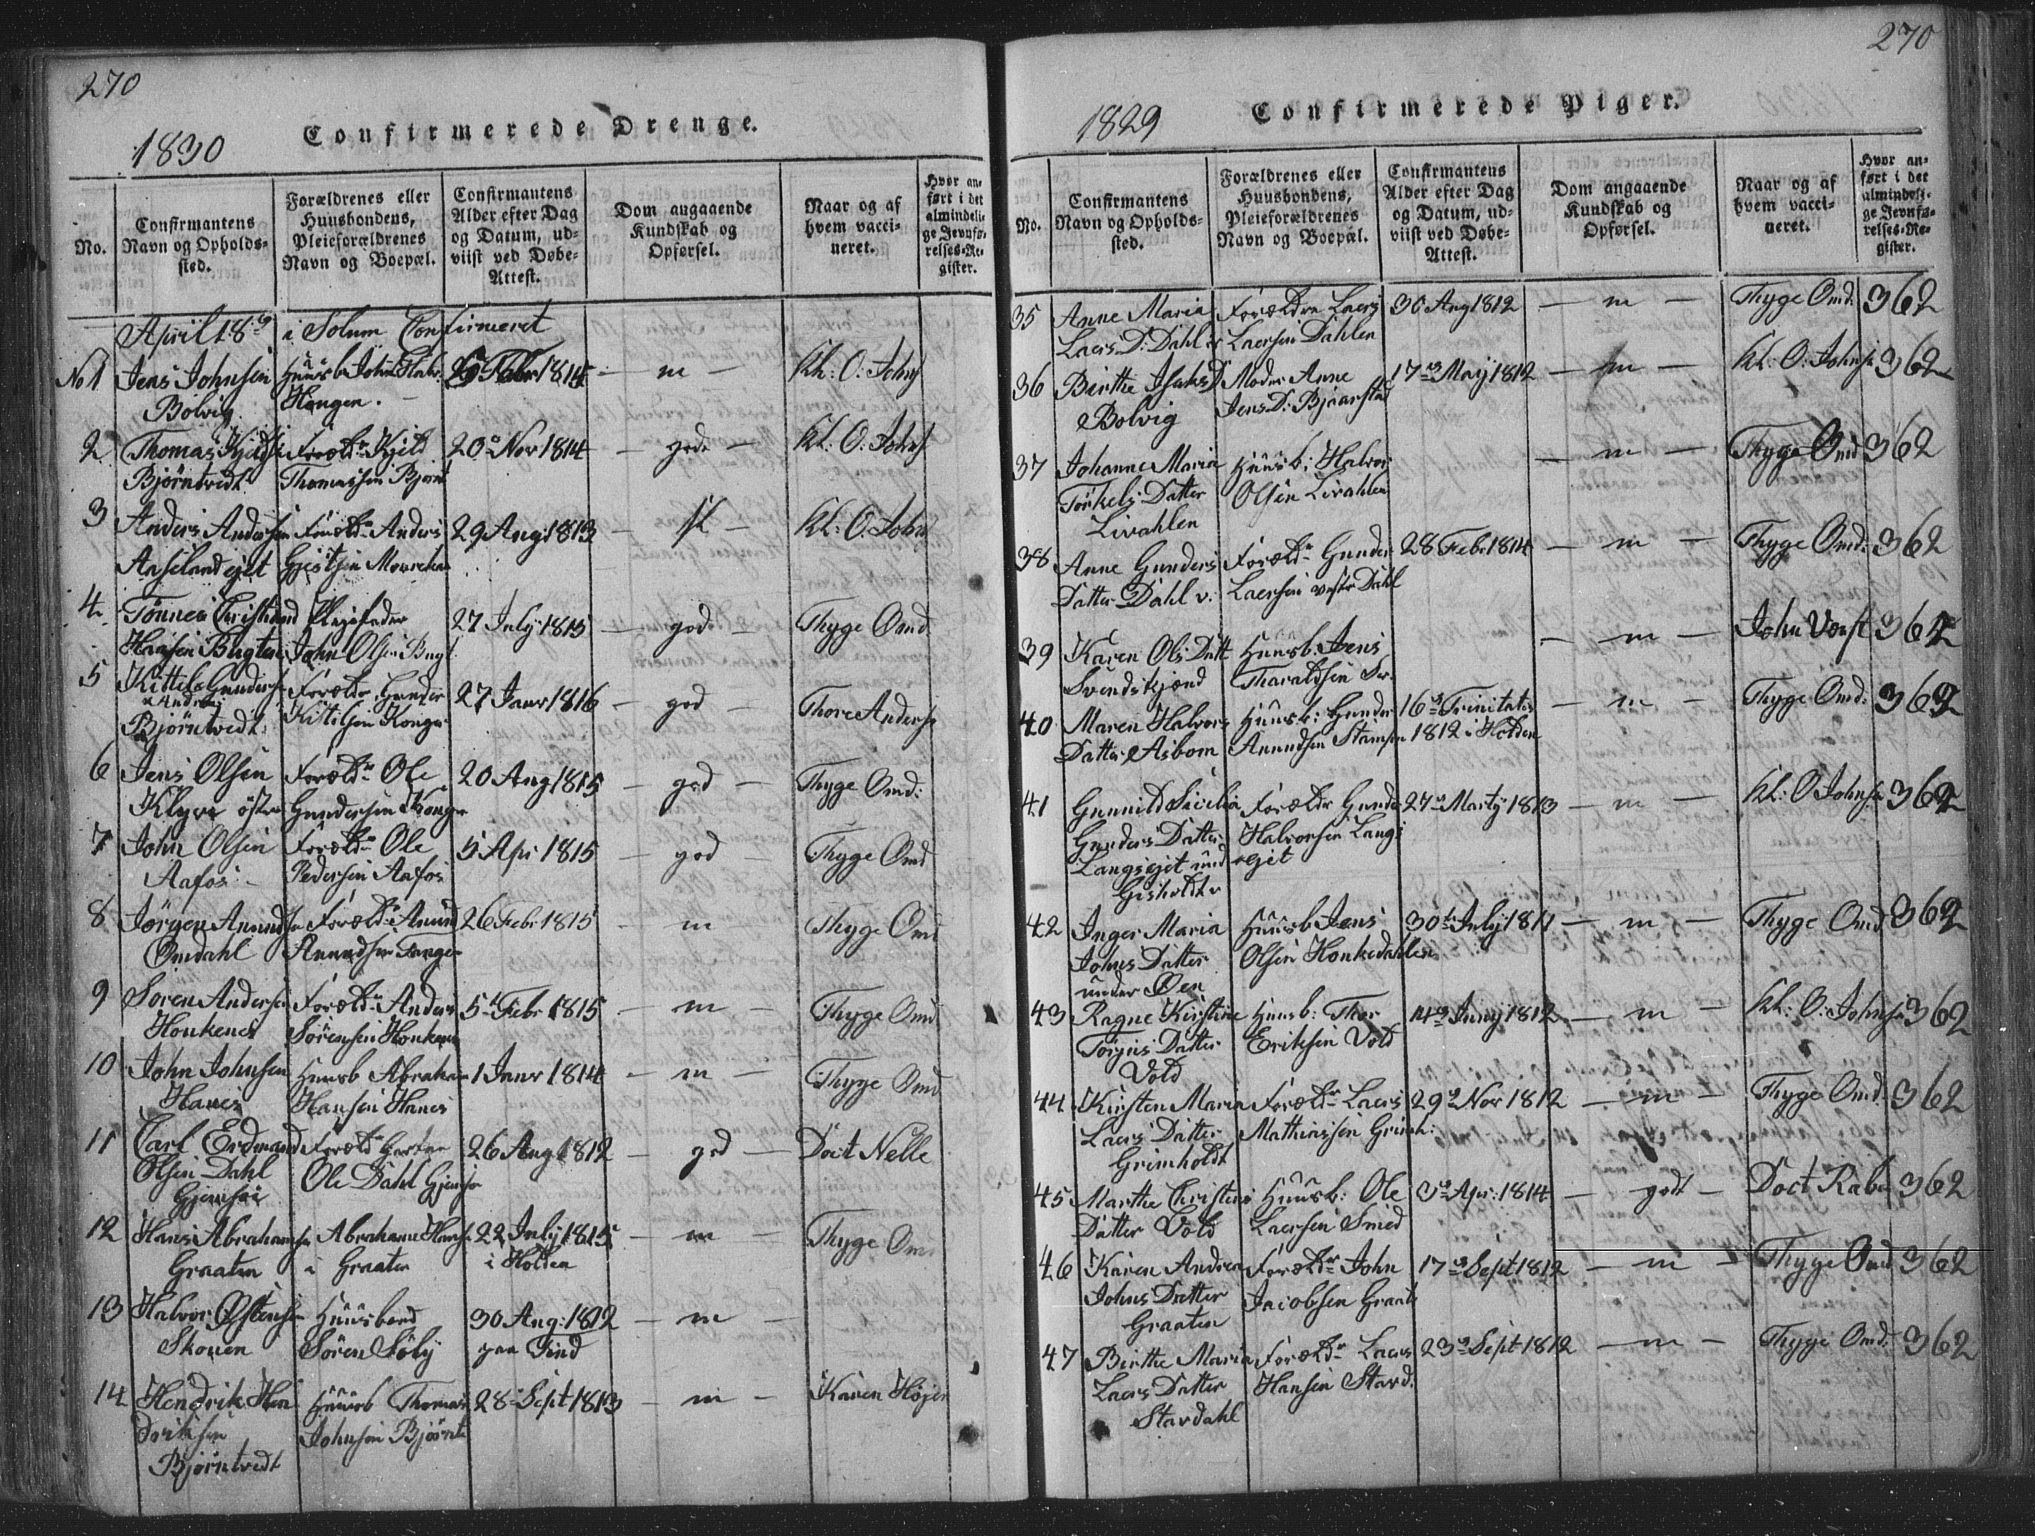 SAKO, Solum kirkebøker, F/Fa/L0004: Ministerialbok nr. I 4, 1814-1833, s. 270